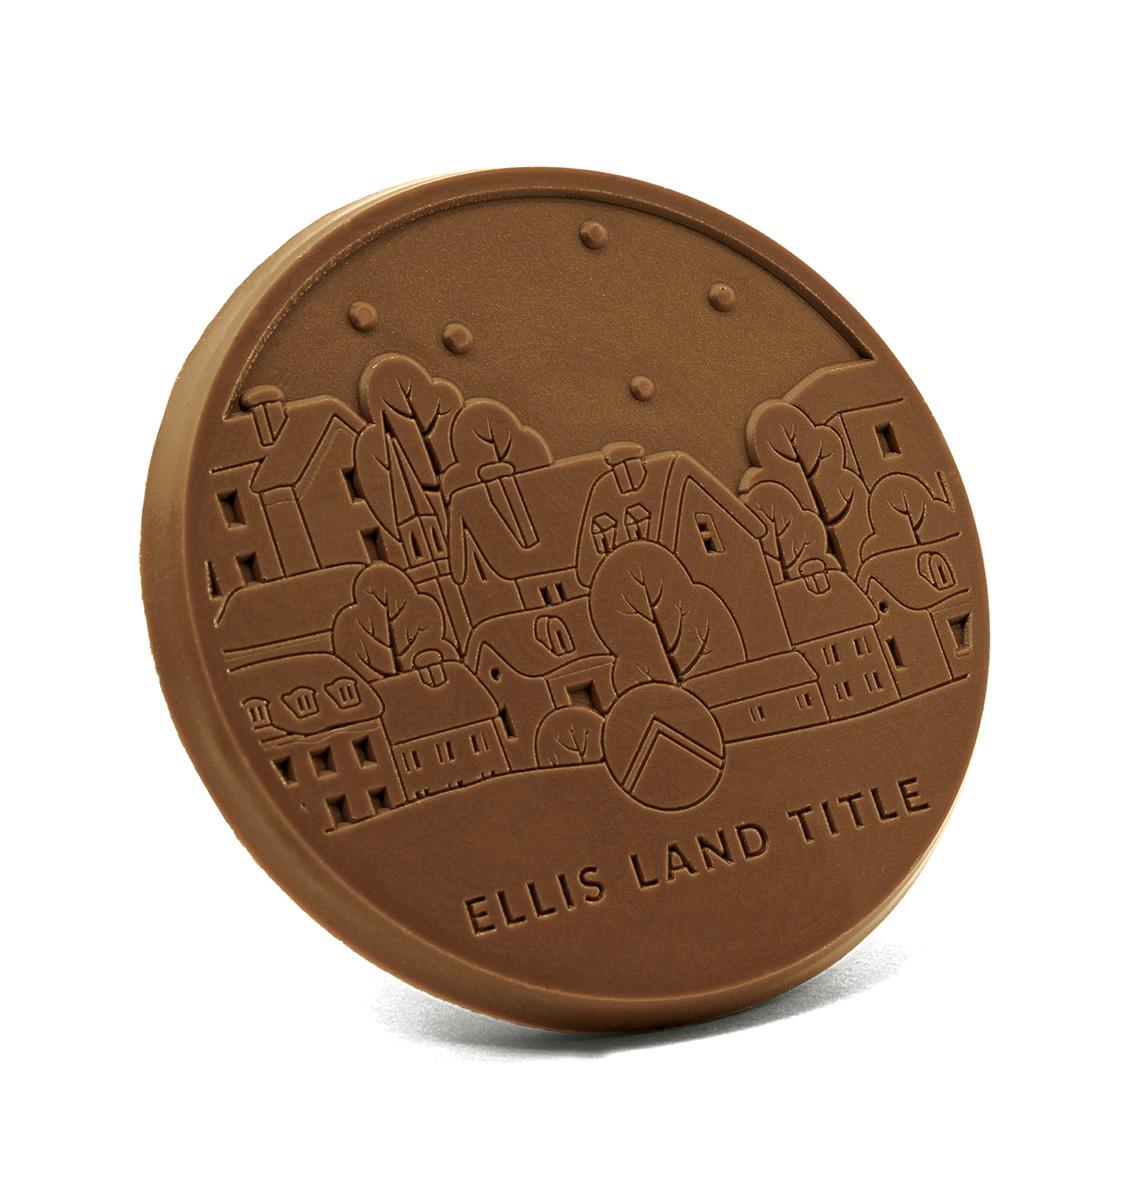 Engraved-chocolate-wedding-favor-gift